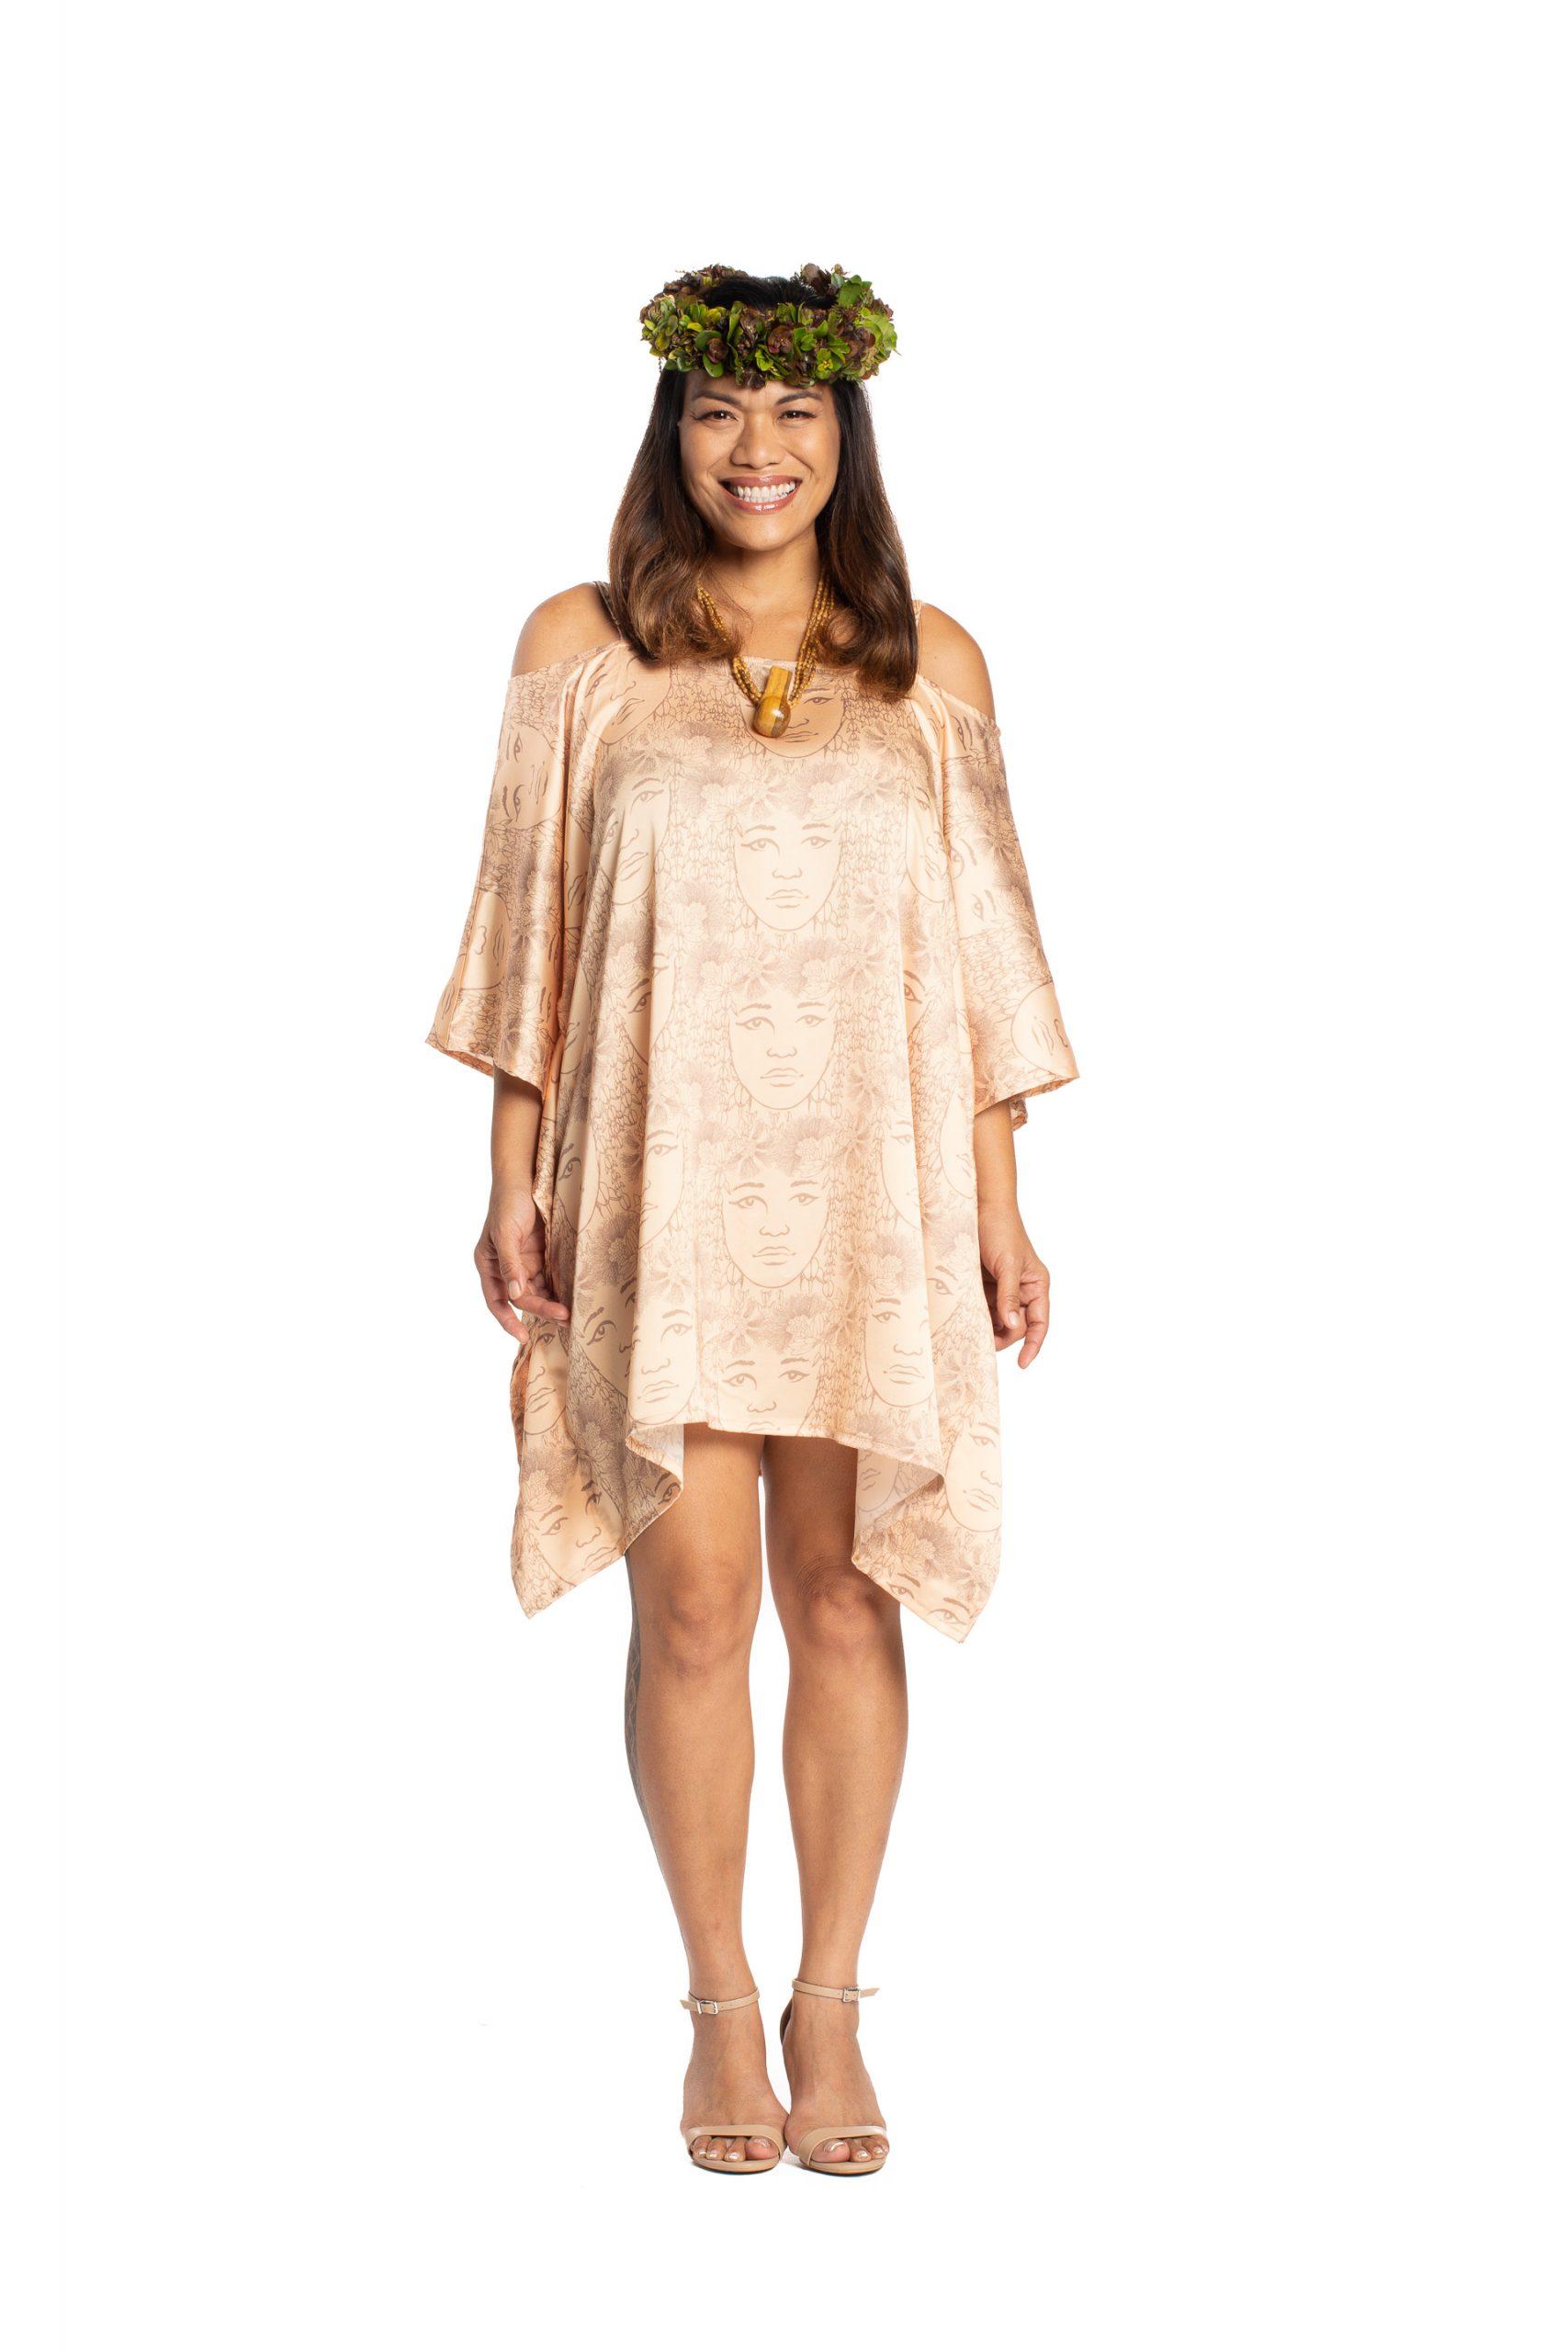 Model wearing Malalama Top in Apricot Sherbert/Gingersnap - Front View